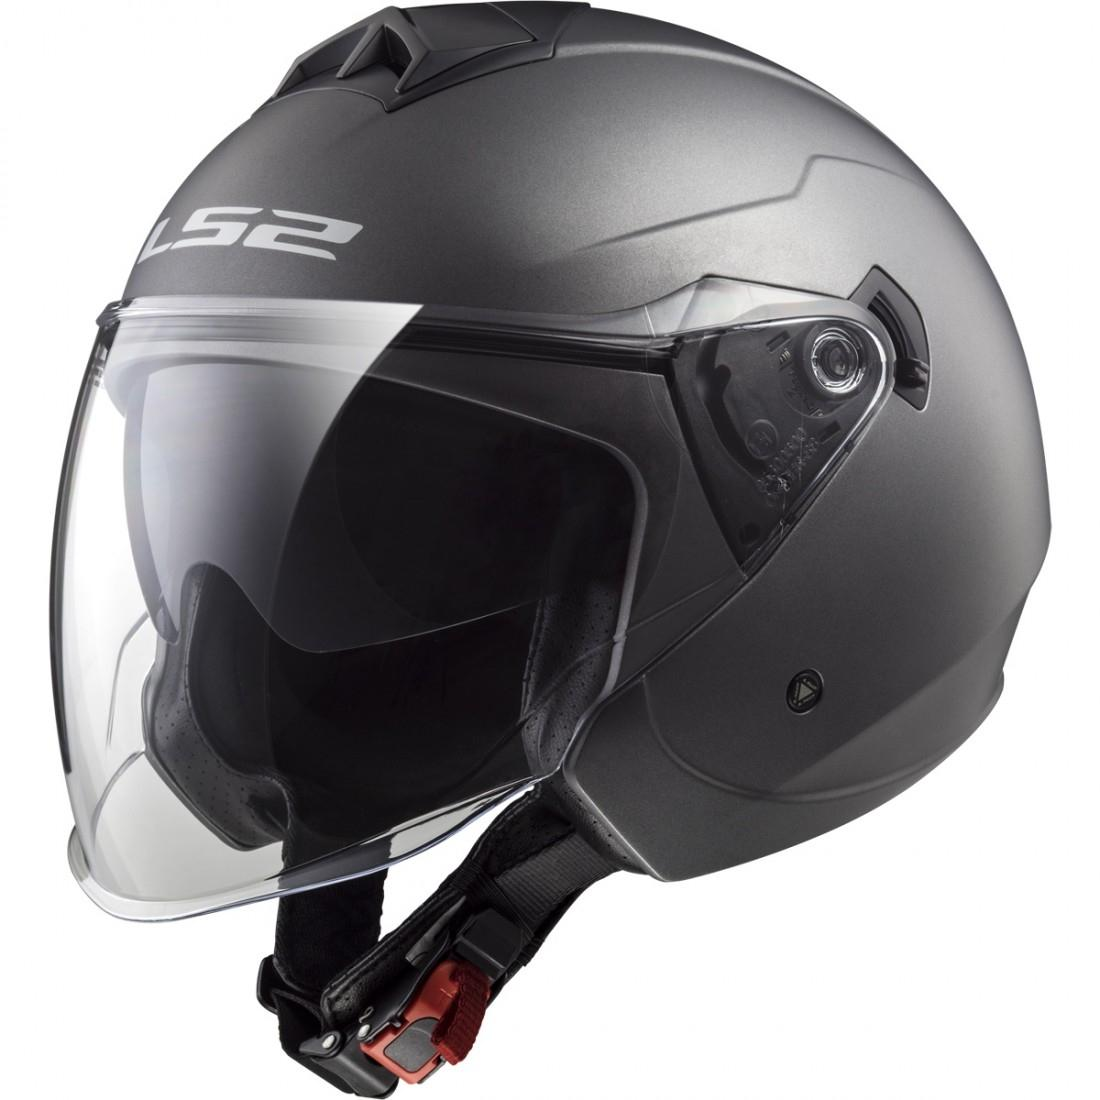 Ls2 Philippines Ls2 Price List Ls2 Motorcycle Helmets